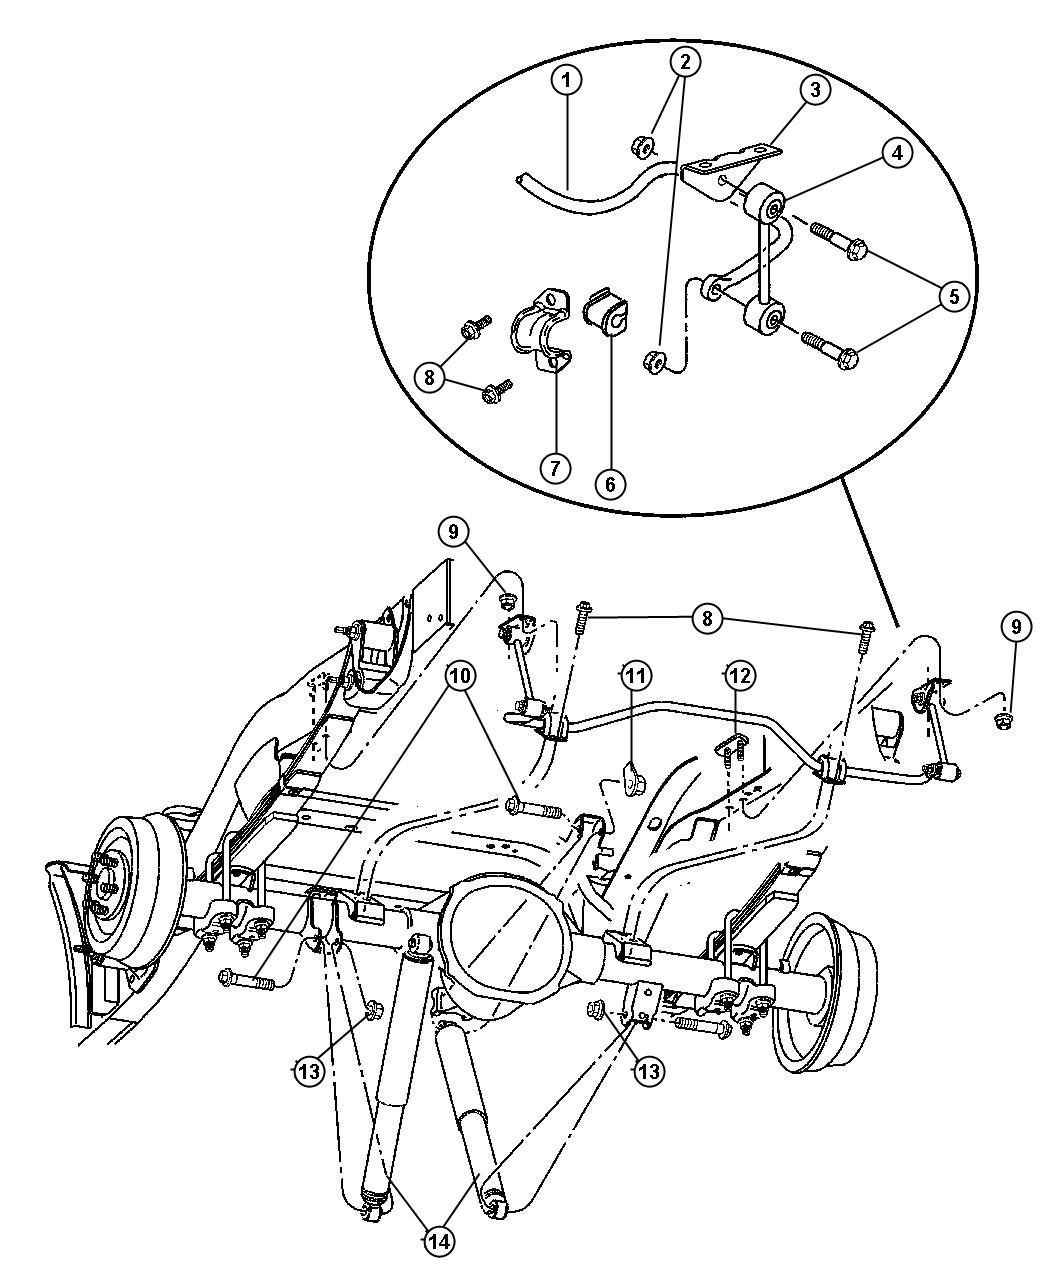 2000 dodge dakota parts diagram dodge 5bkas